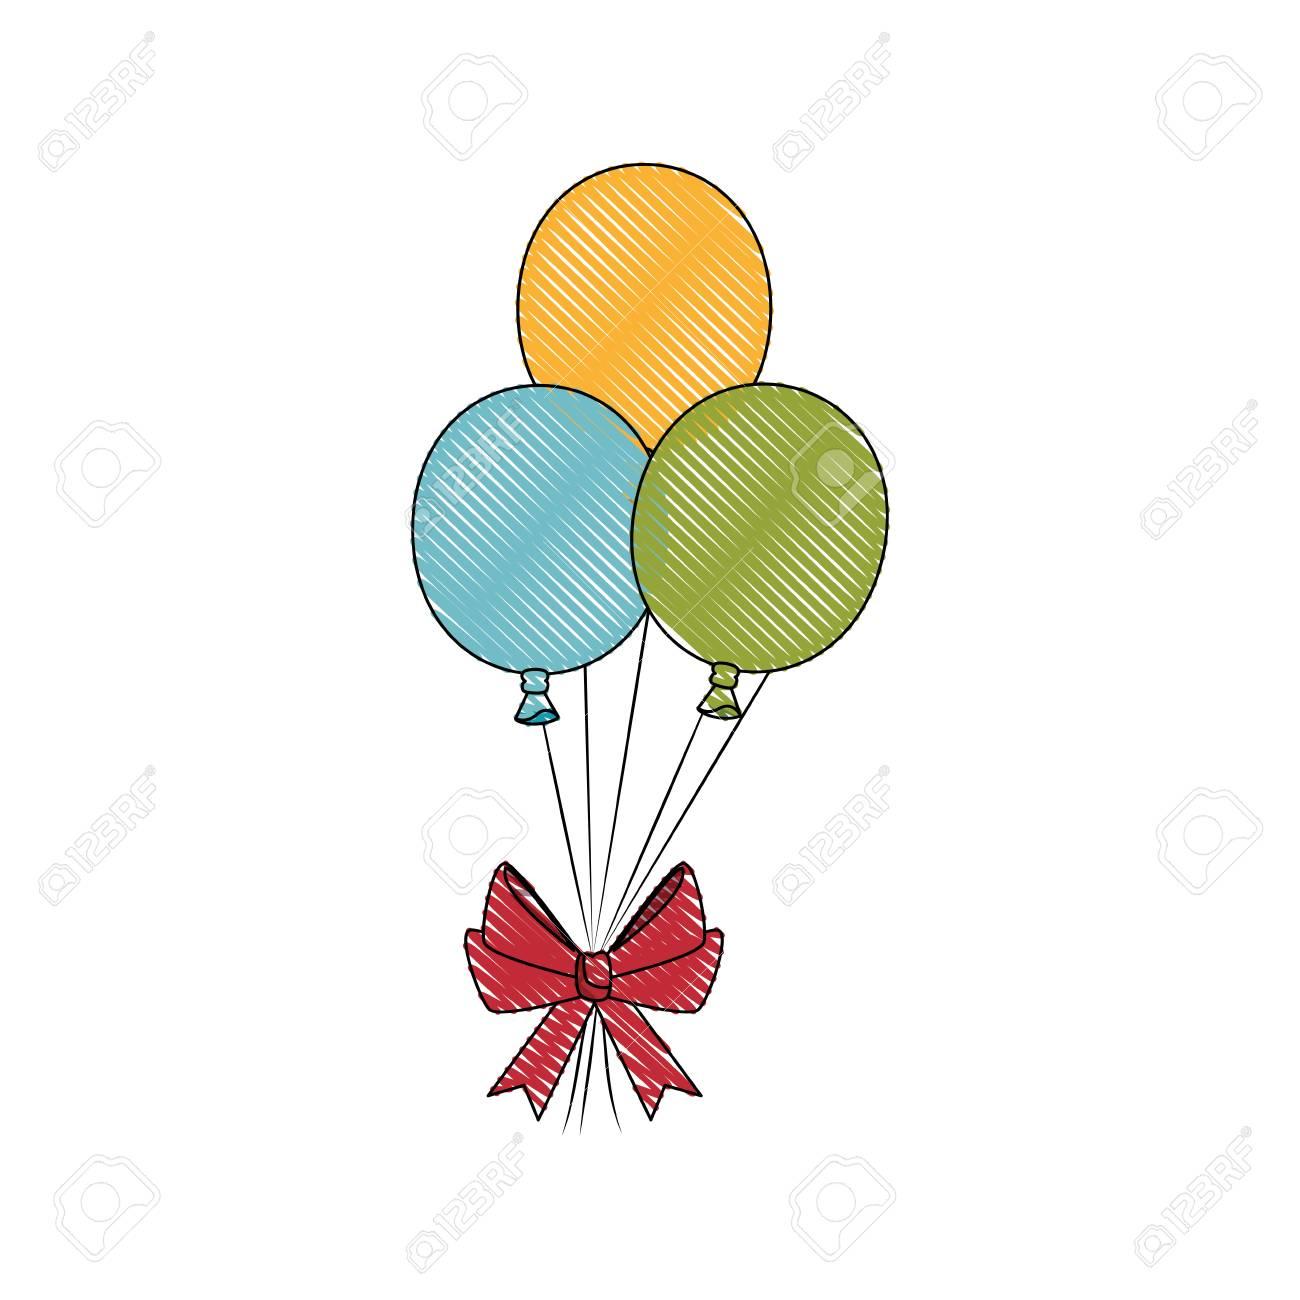 balloon bow globe vector illustration graphic design icon royalty rh 123rf com balloon graphic design balloon graphic art